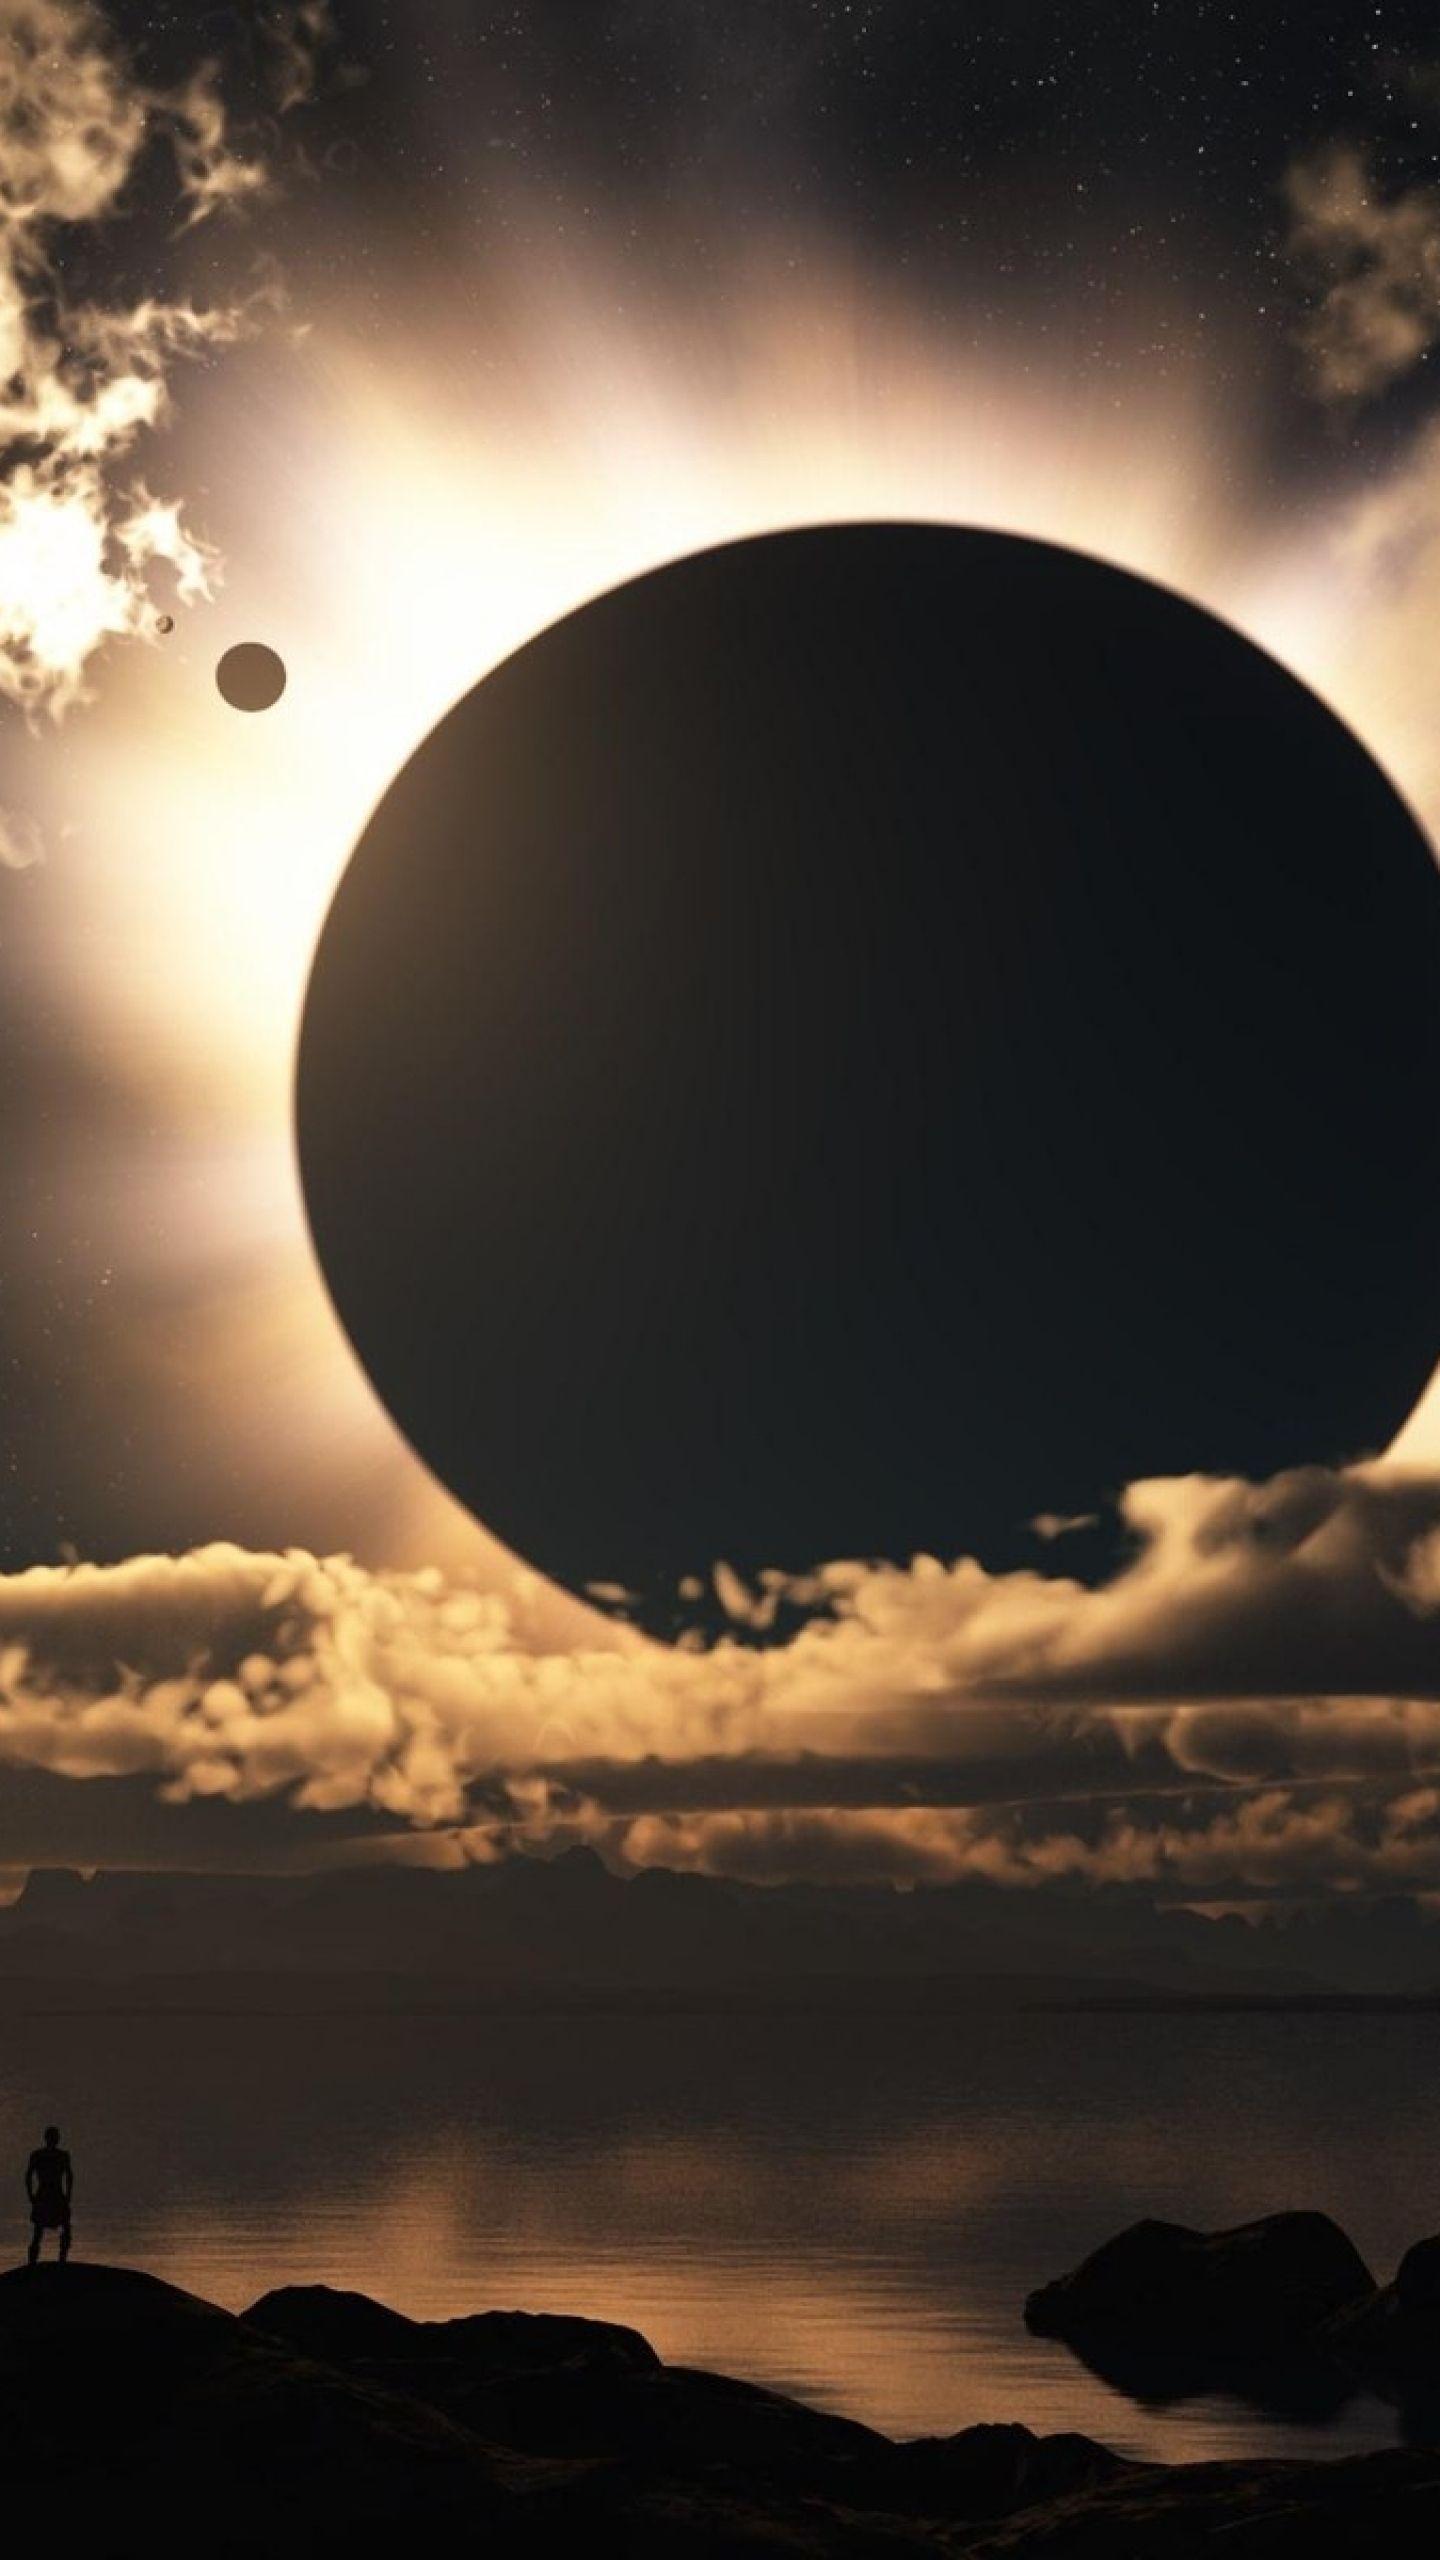 Planet Eclipse Wallpapers Wallpaper